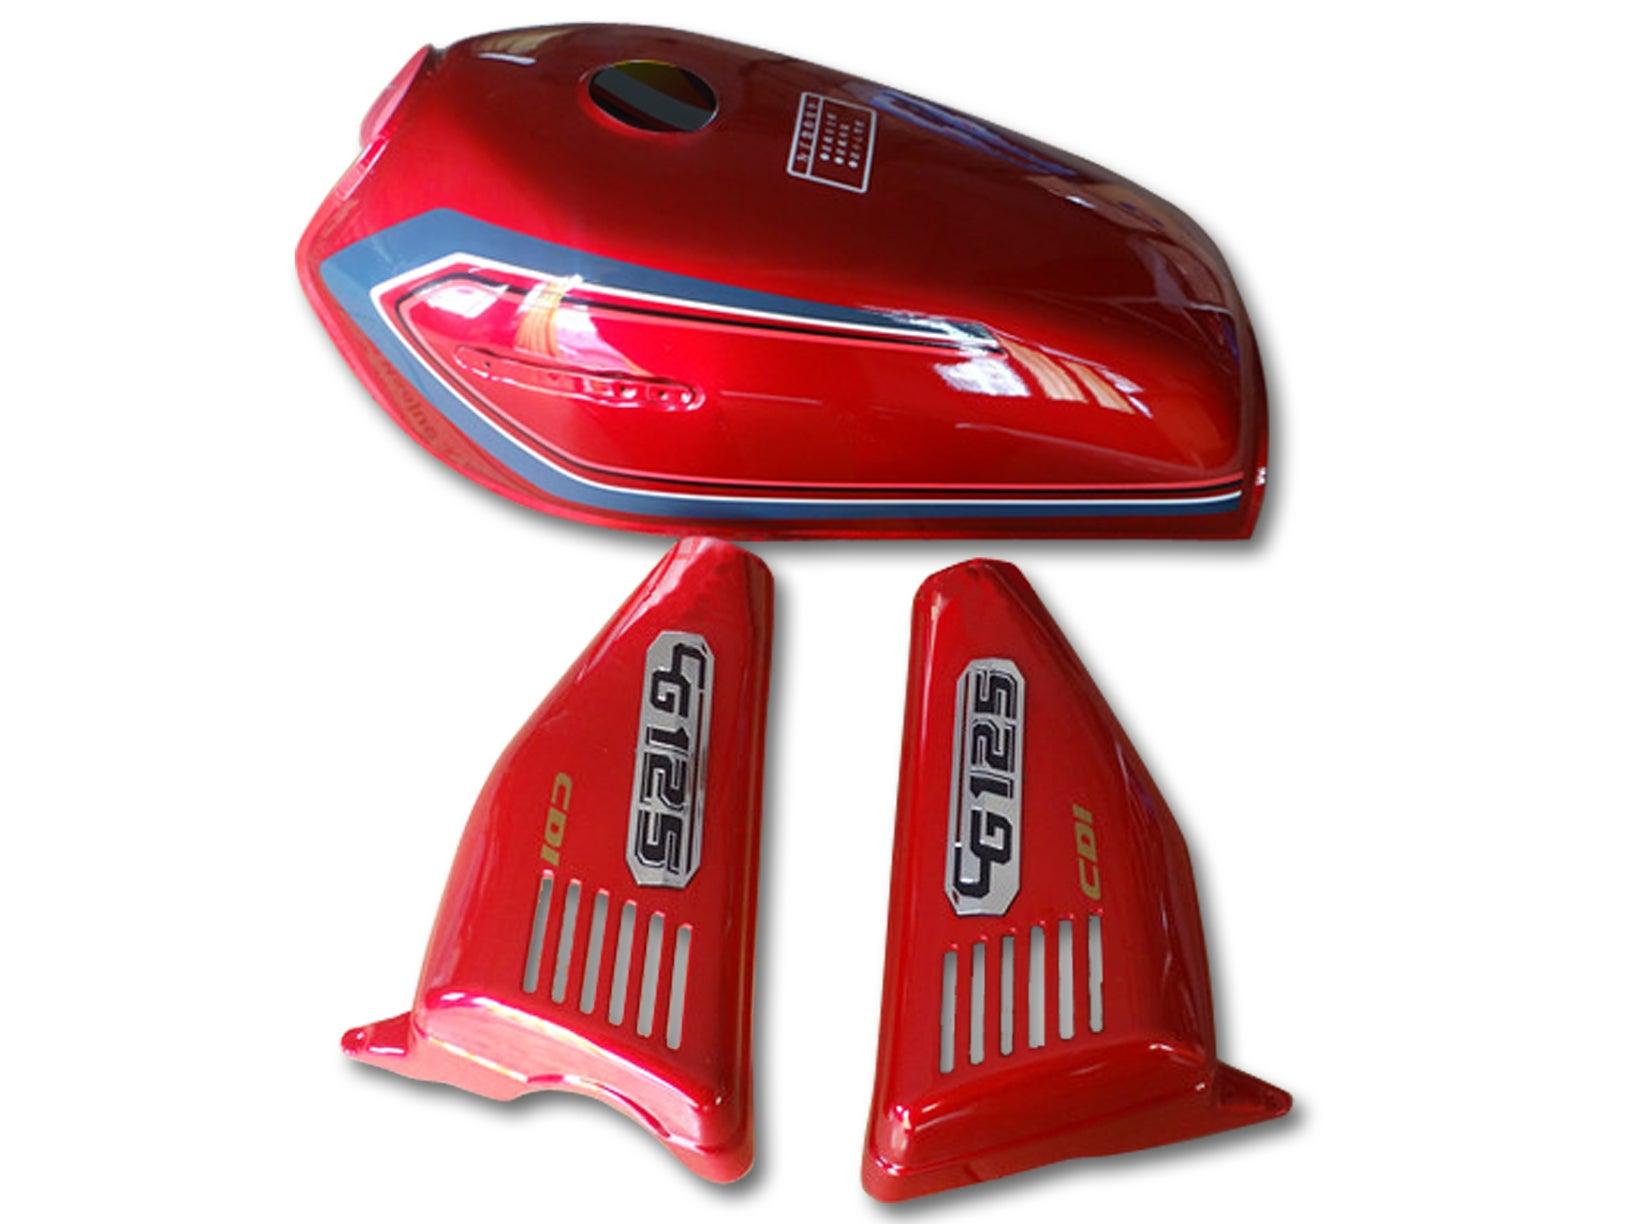 Cafe Racer Honda CG125 Fuel Tank/ Gas Tank Cover Set 1 ...